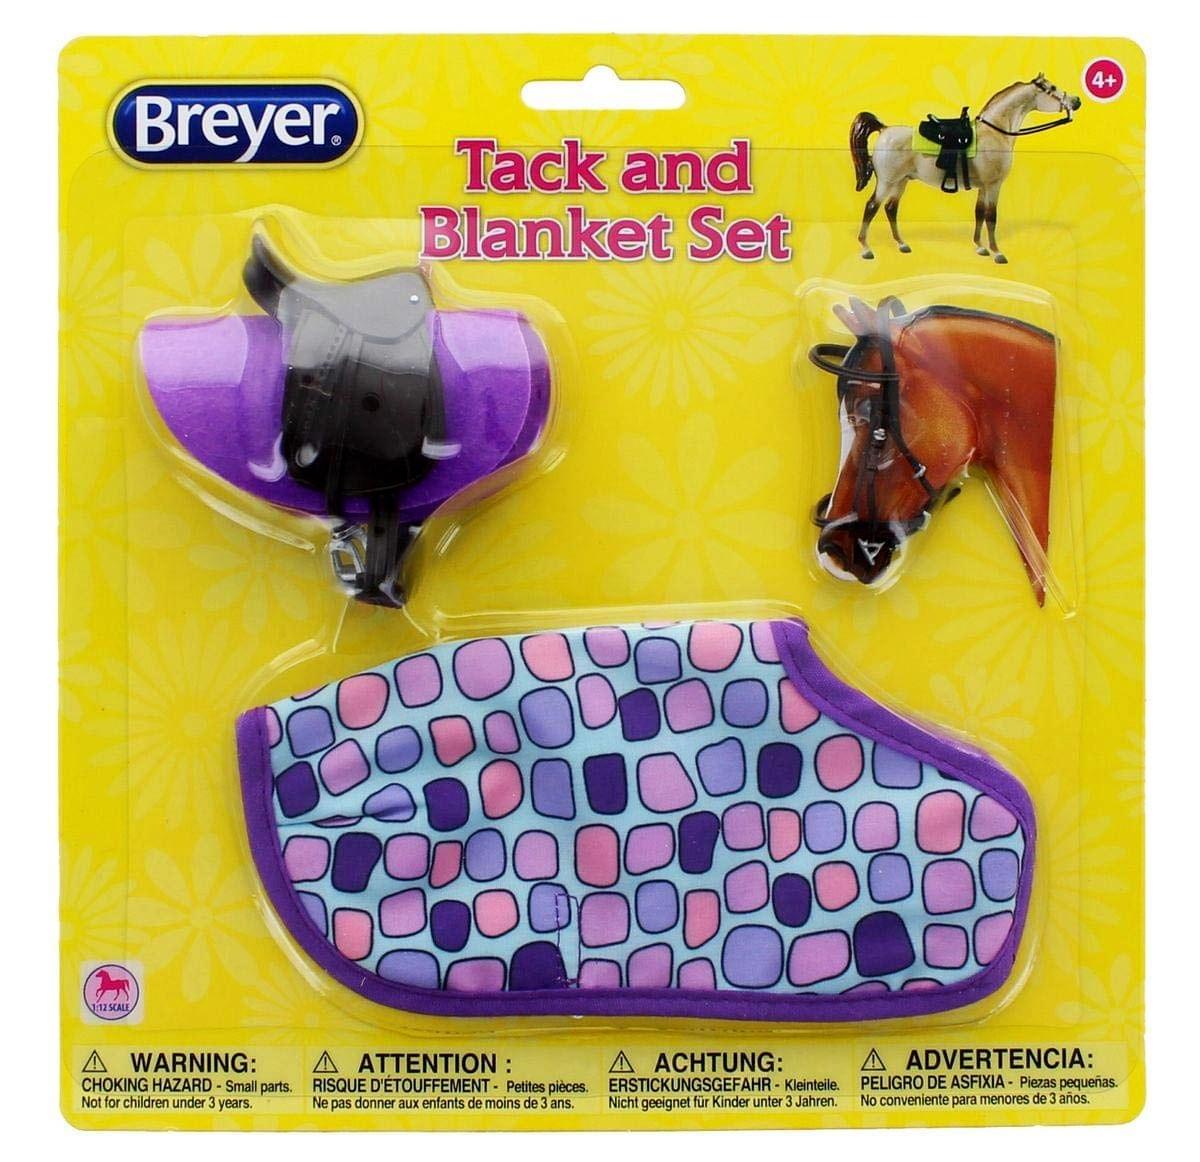 Breyer Horses English Saddle Tack Blanket Set Purple Dots Classic 1 12 Scale W61130 Model Horses